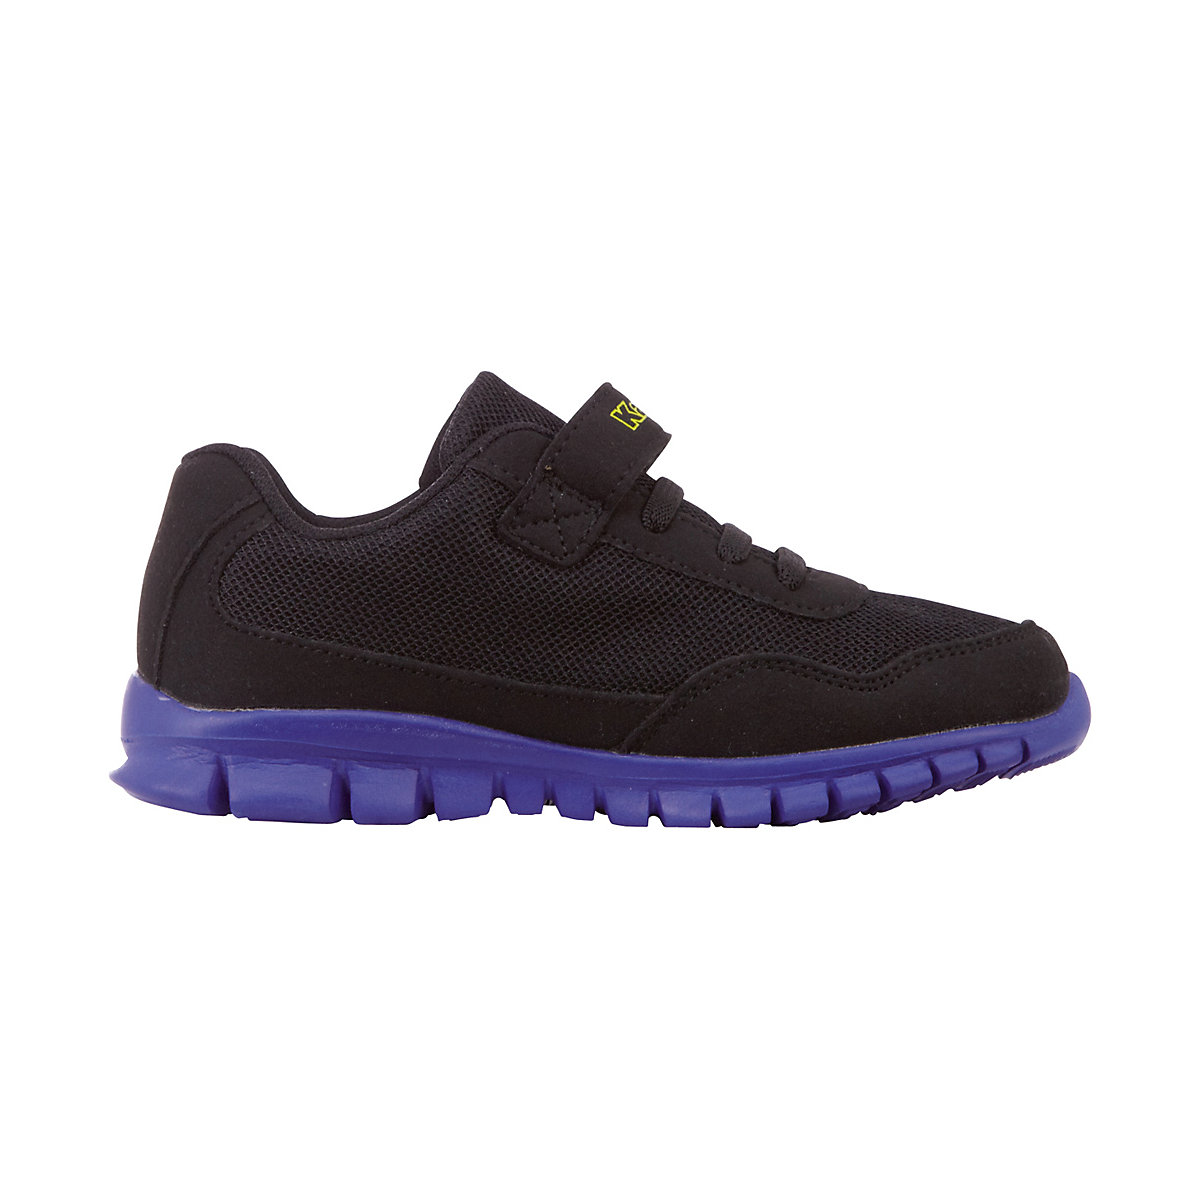 Kappa, Sneakers Low Follow Bc Für Jungen, Schwarz